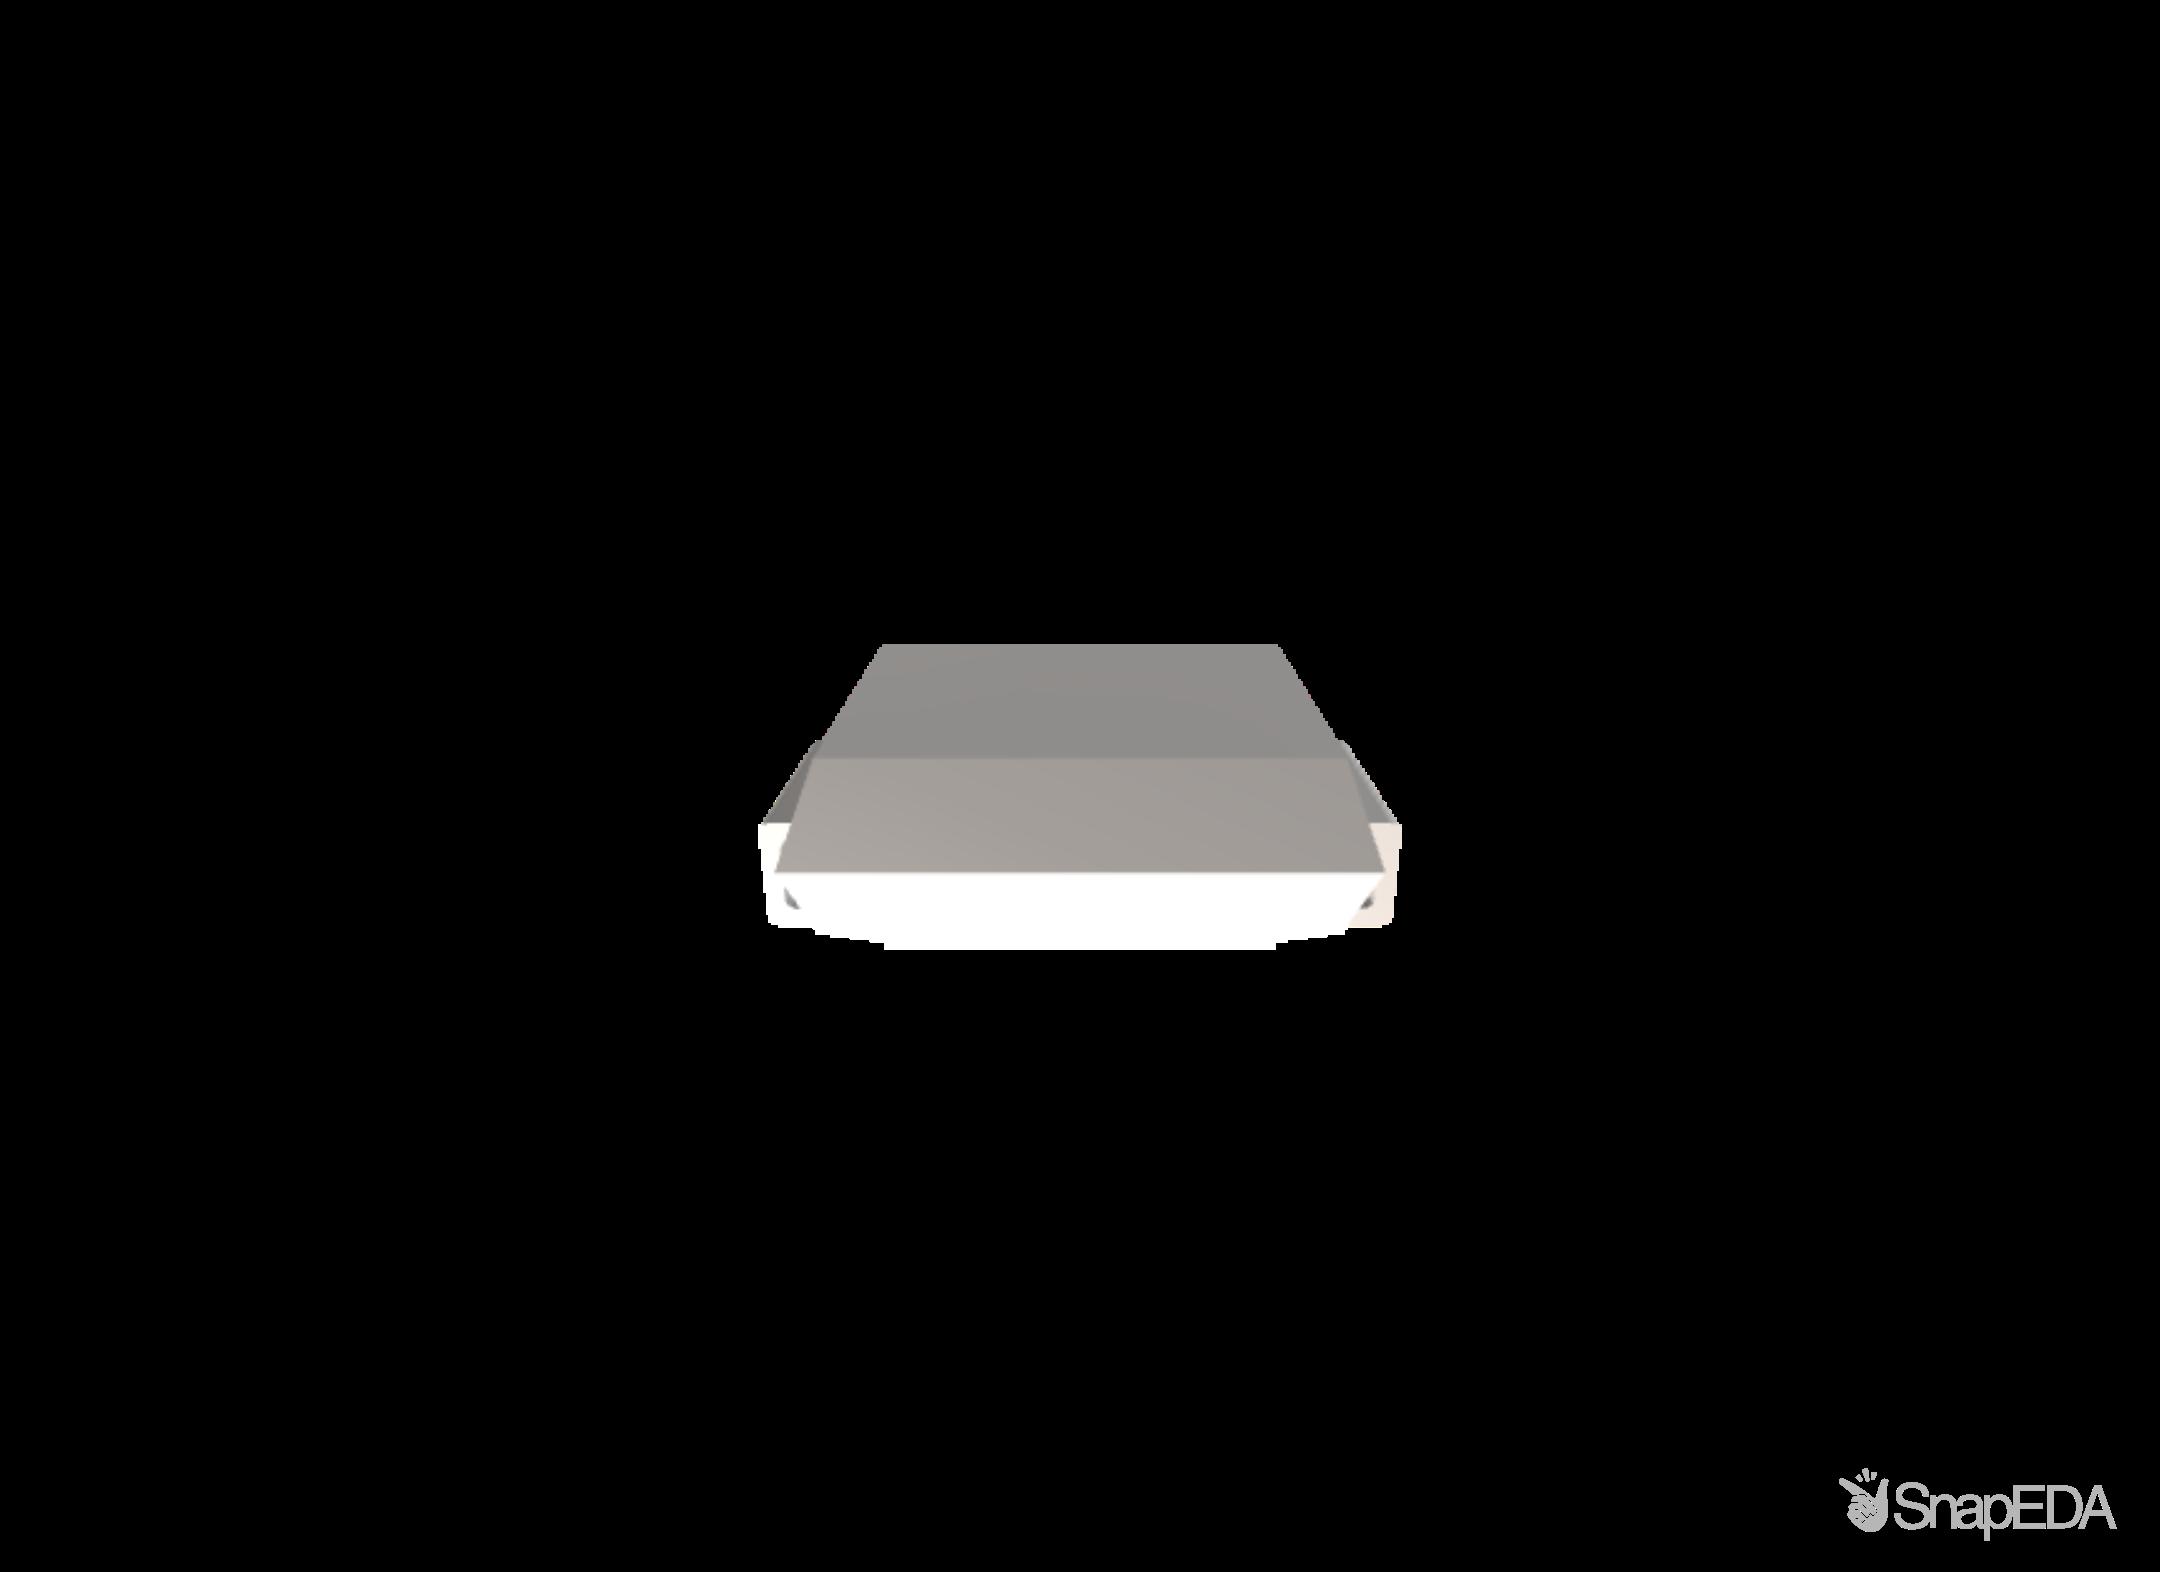 5.0SMDJ15A 3D Model